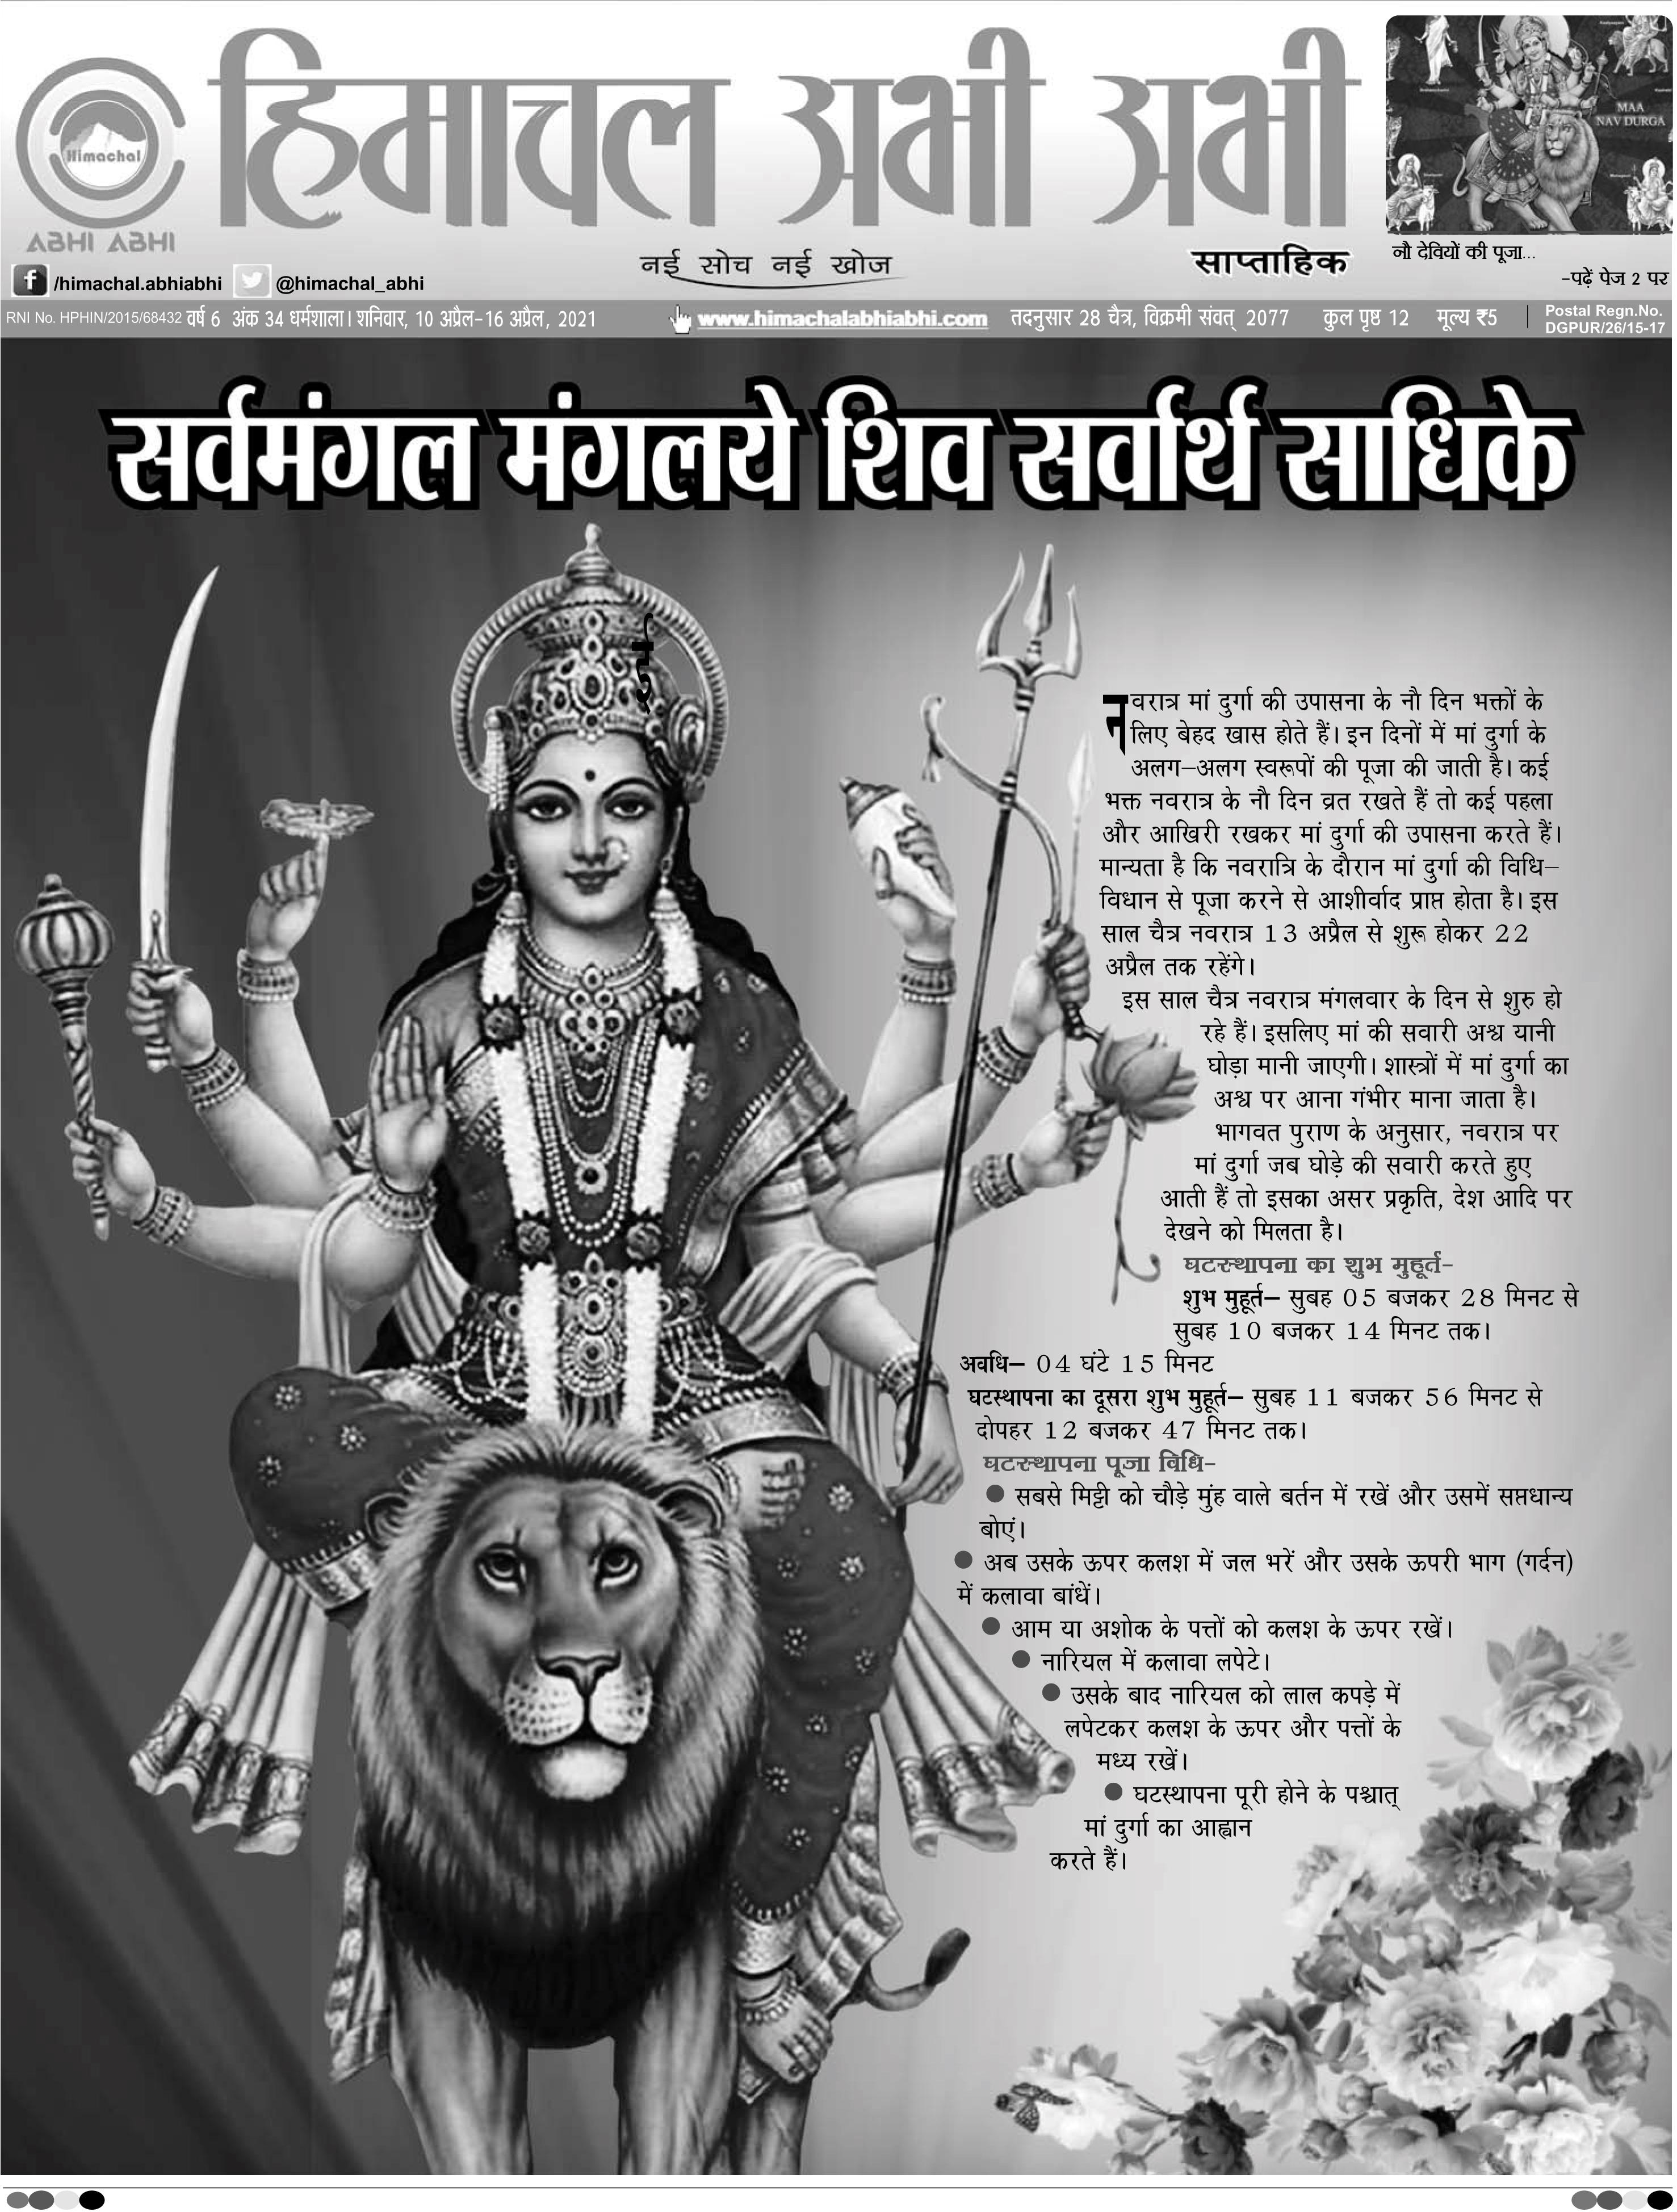 Himachal Abhi ABhi E-paper 10-04-2021